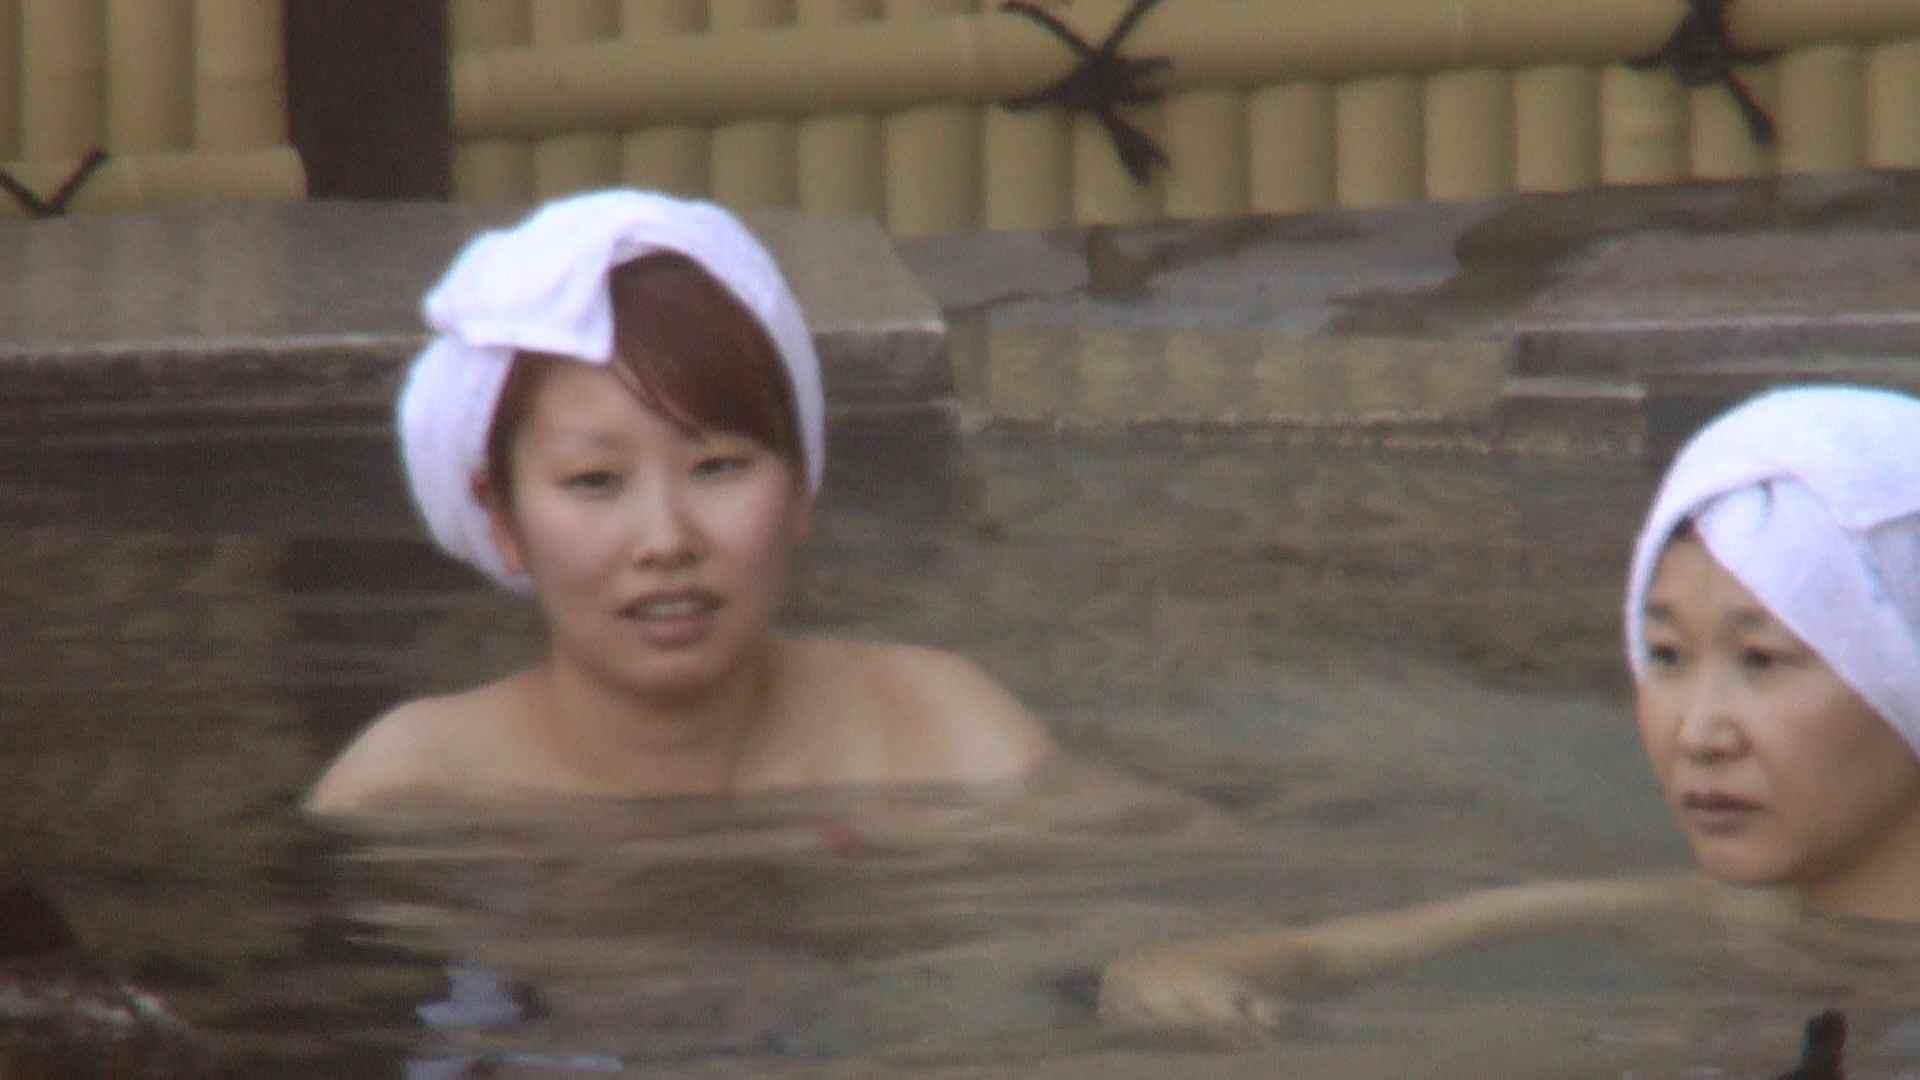 Aquaな露天風呂Vol.210 露天風呂編  86PIX 42